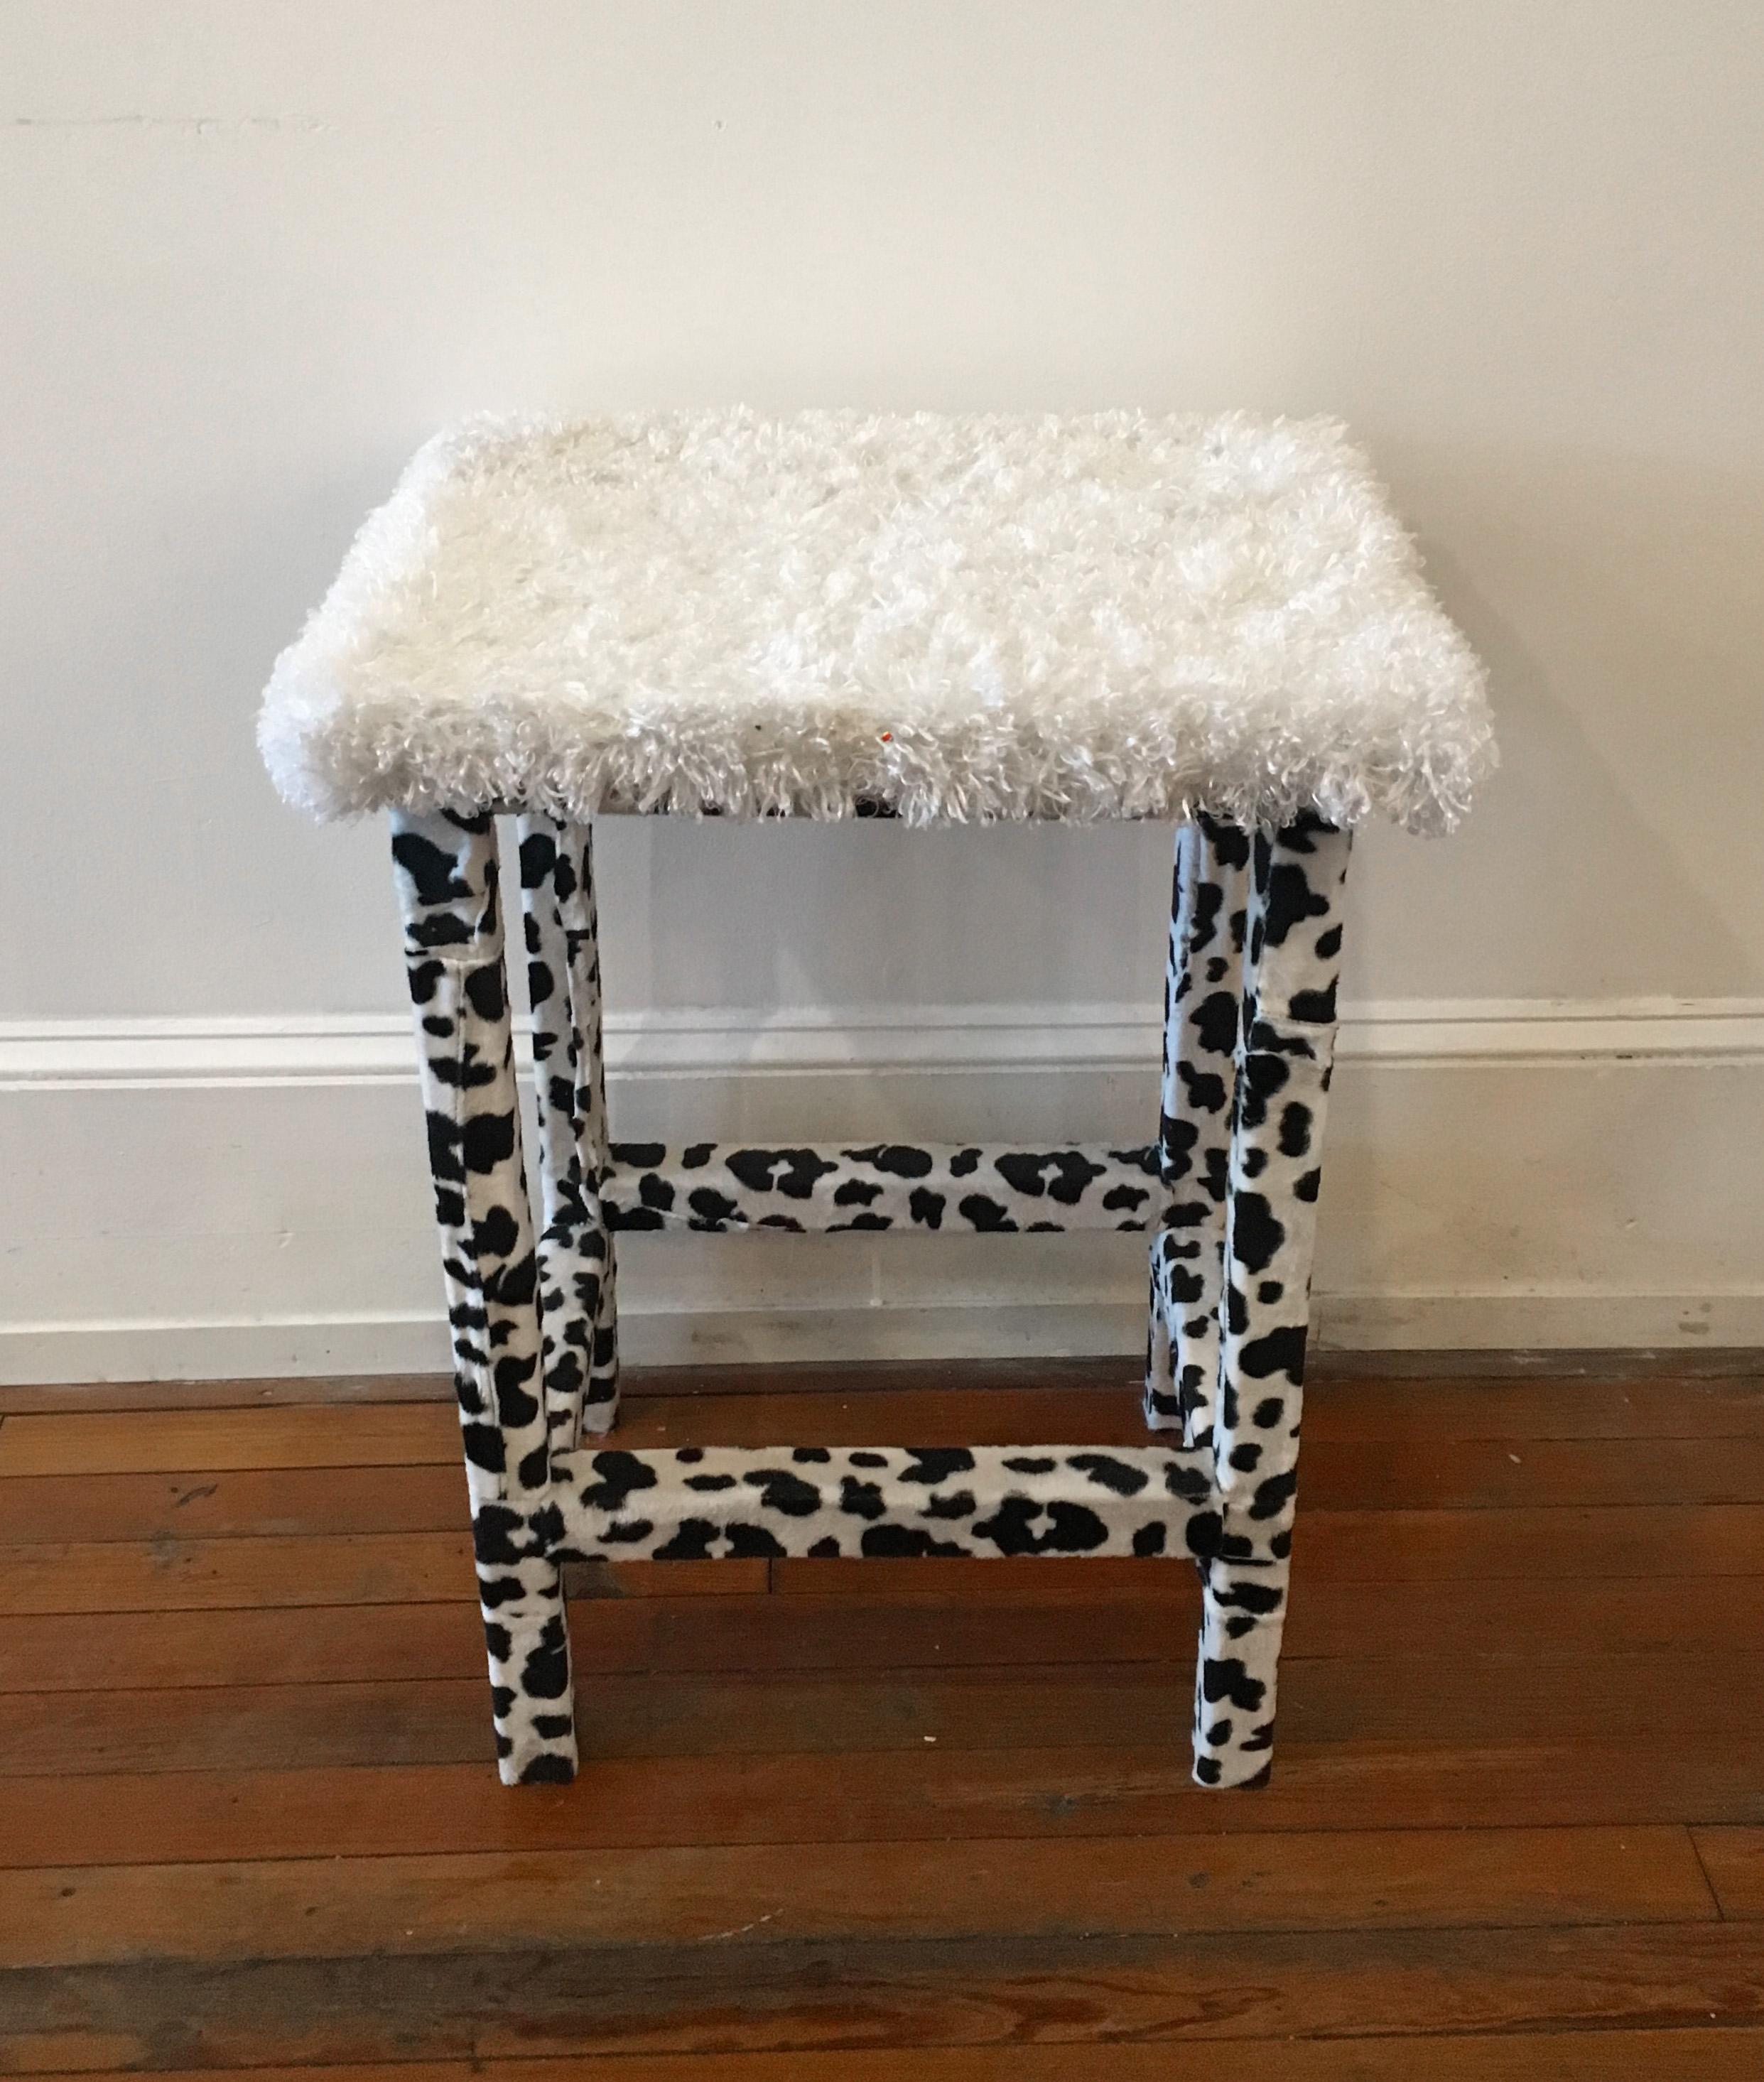 plush table #2.jpg